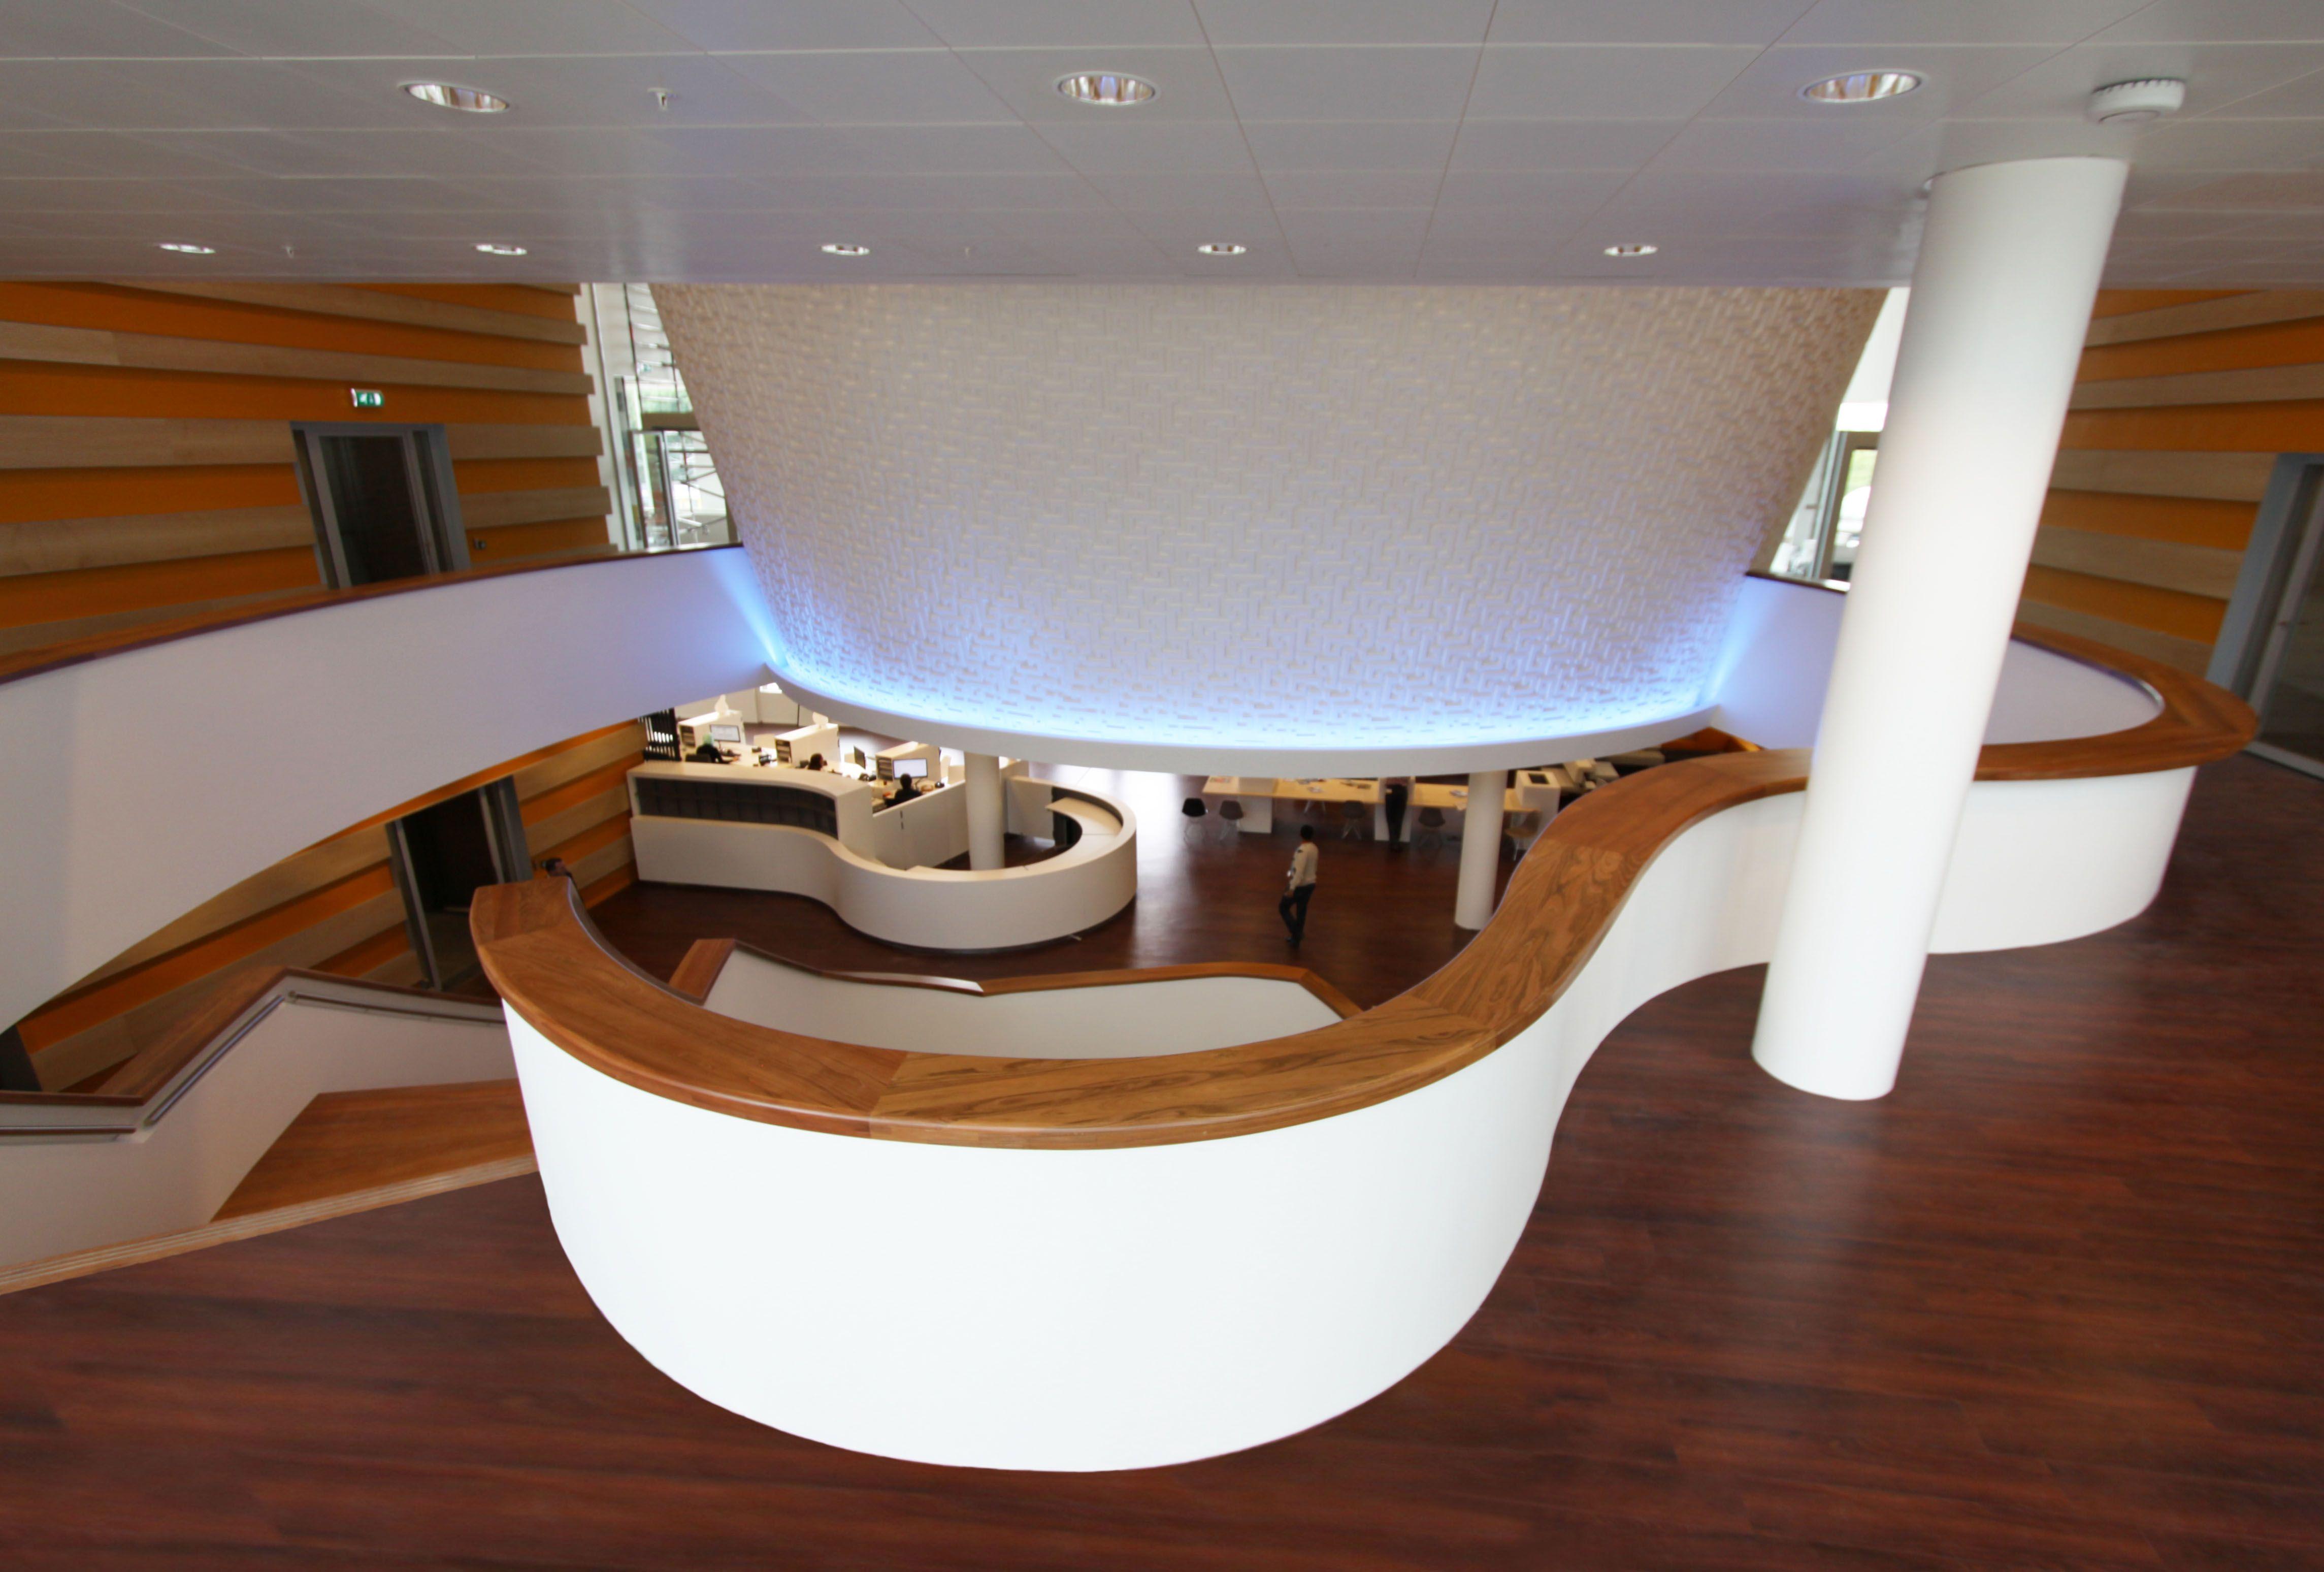 interieur #trap Huis van de stad Gouda | Business | Pinterest